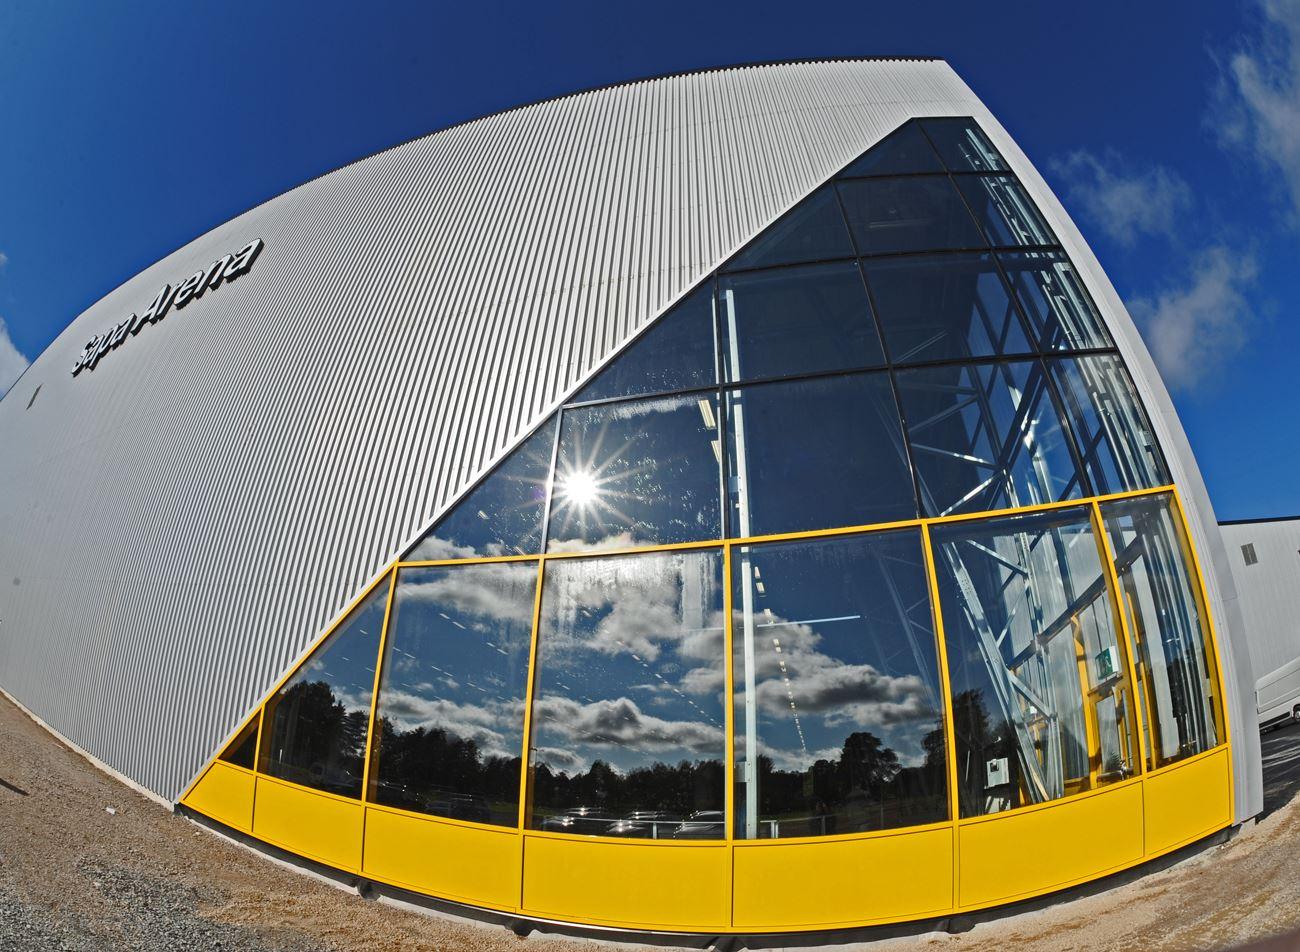 Arenorna på Tjustkulle - Sapa Arena och Heds Arena- Skridskoåkning